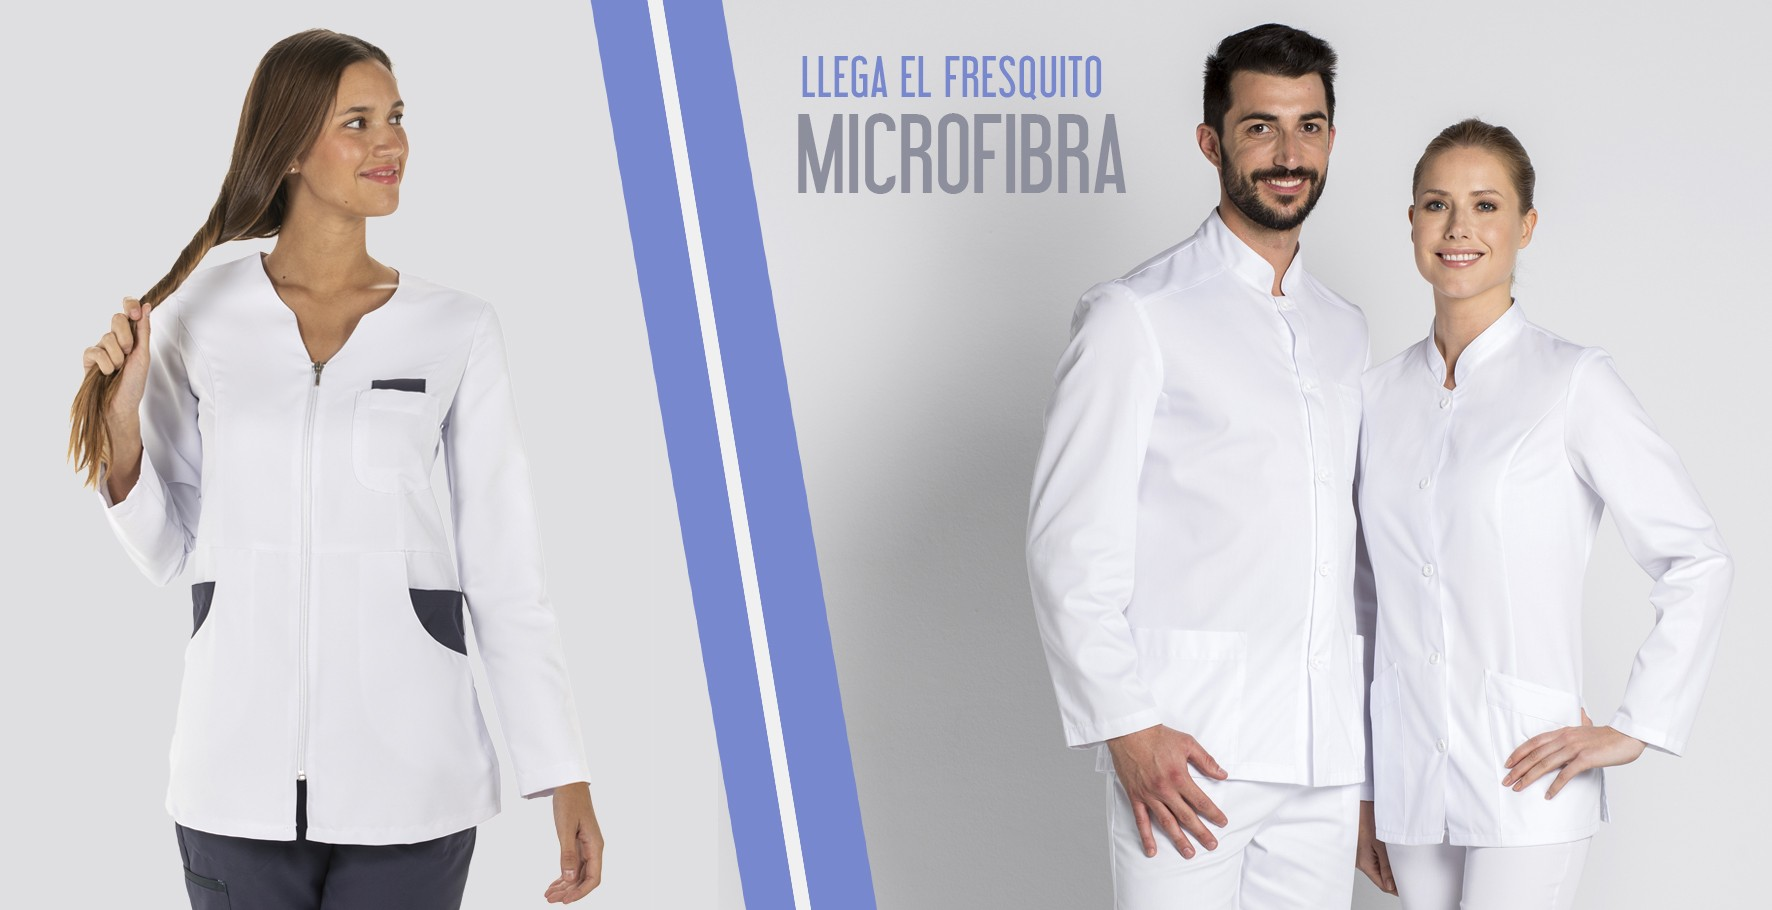 chaqueta sanitaria blanca